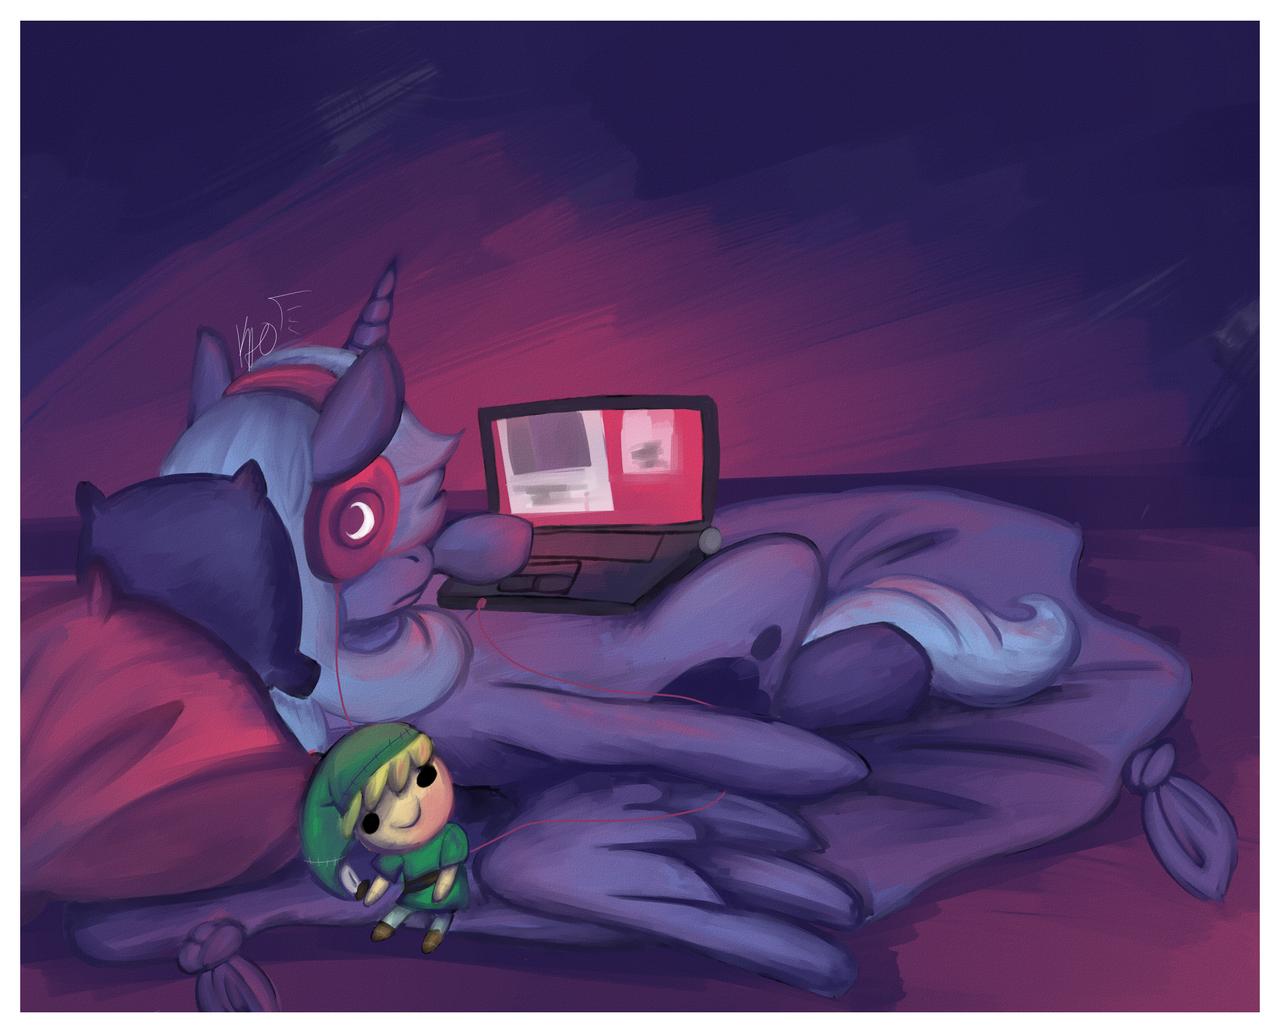 Late-Night Blogging by KaoKay